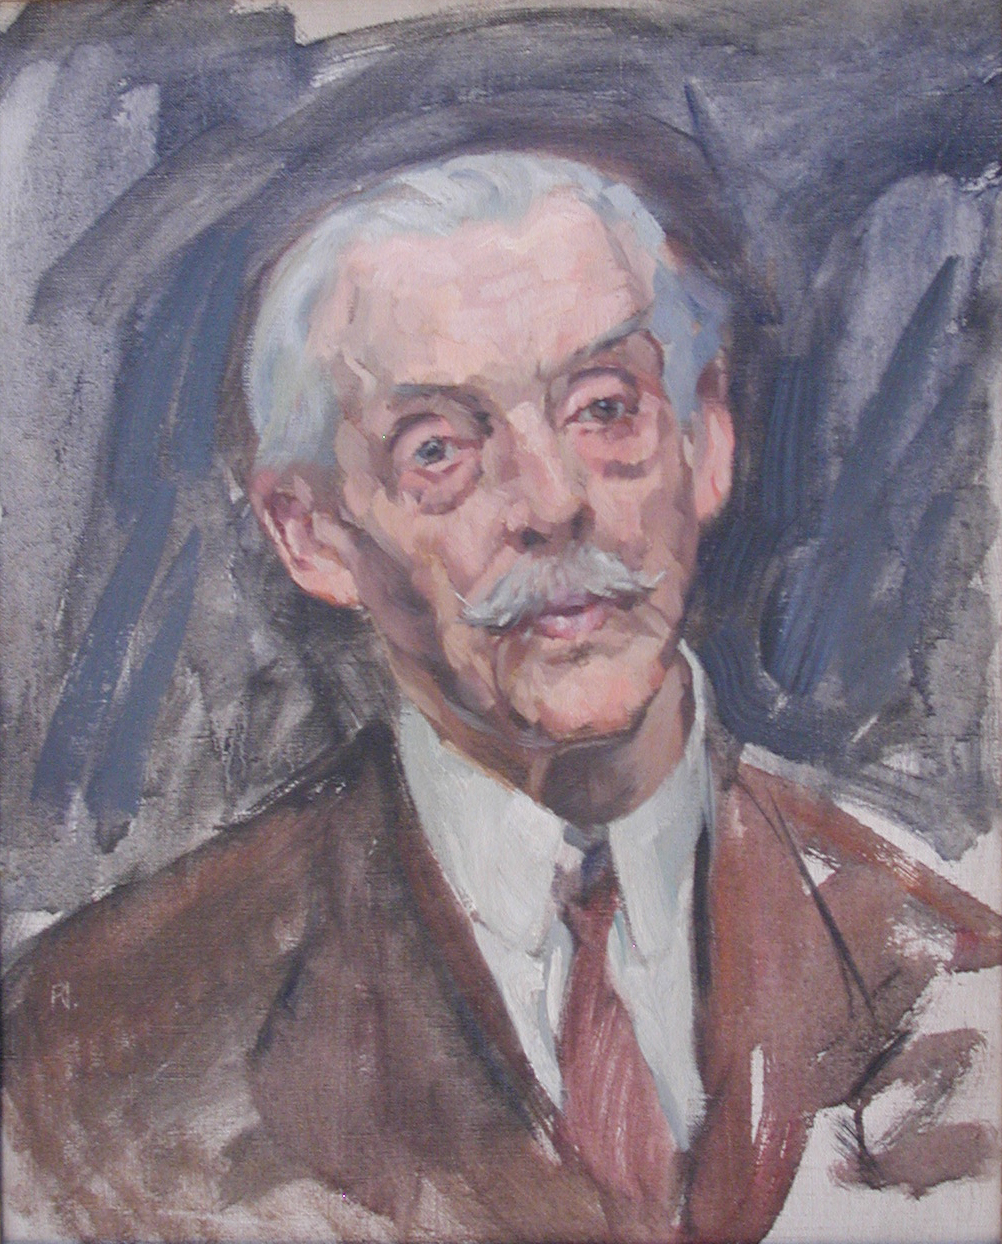 Portrait of an Older Man with Moustache